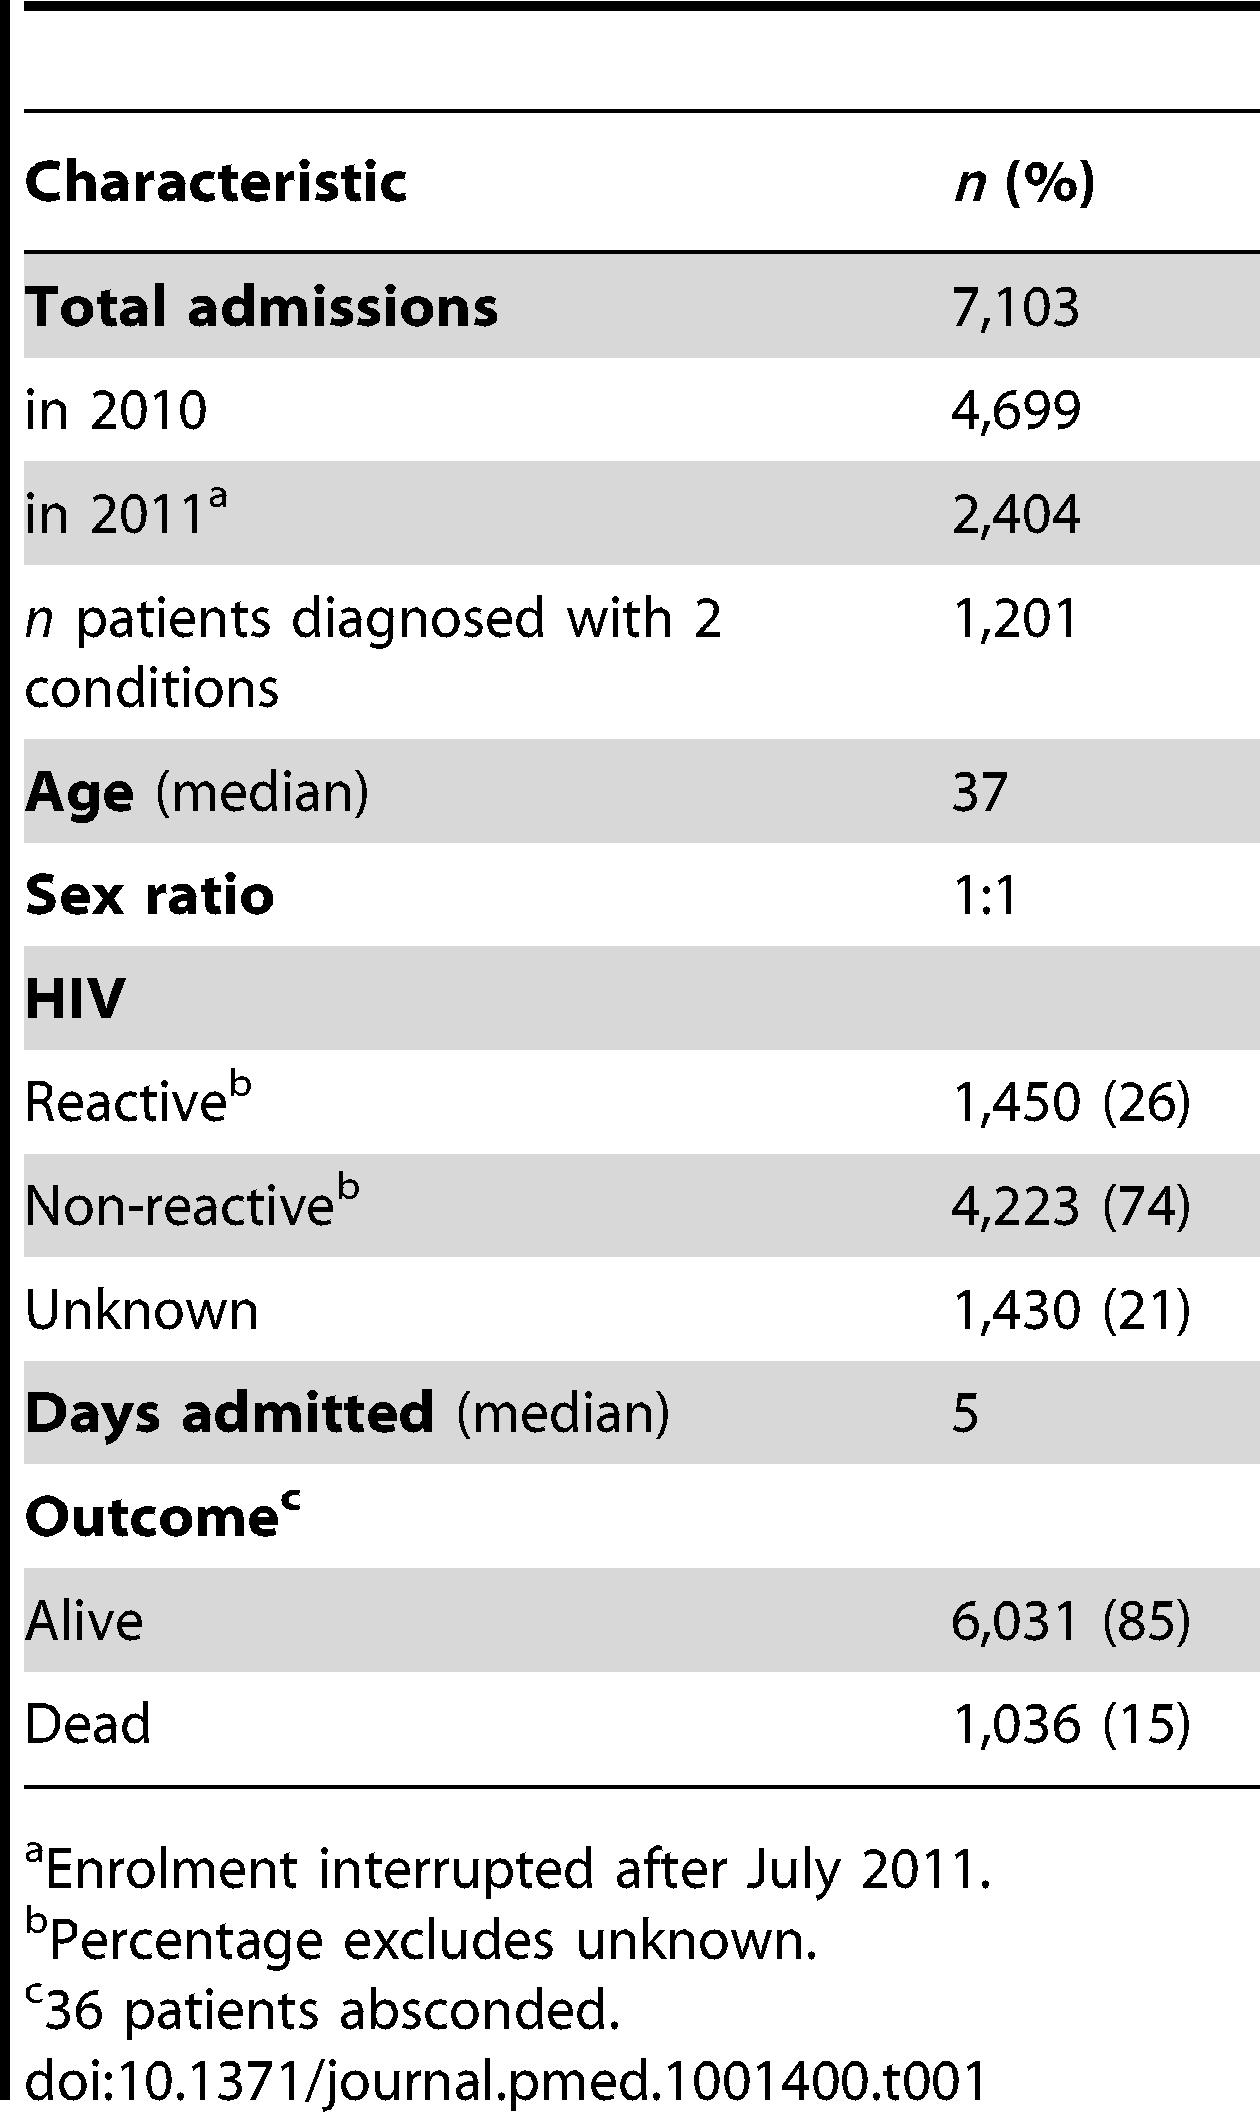 Summary statistics.